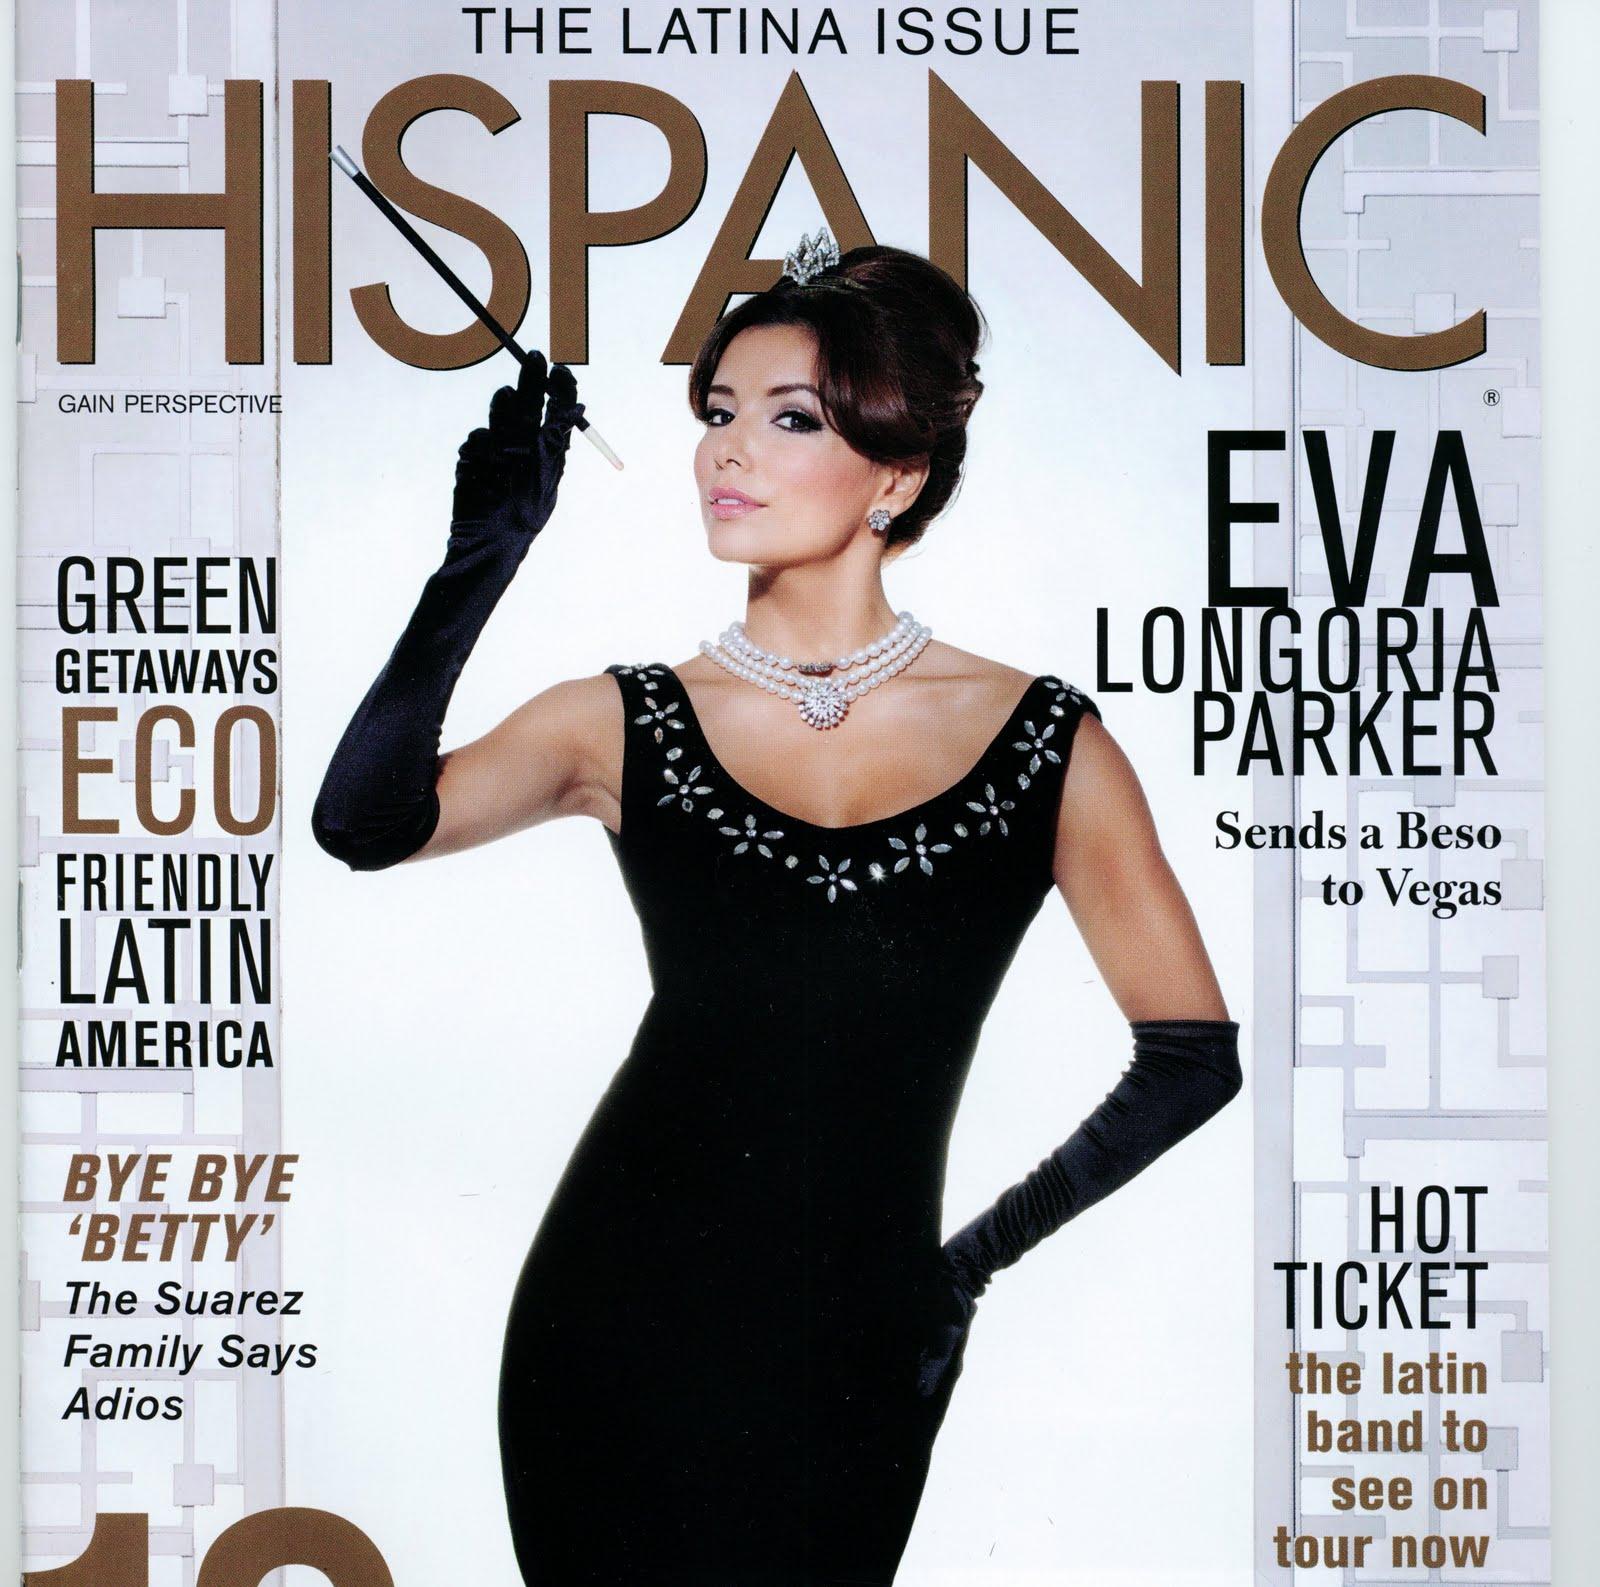 http://3.bp.blogspot.com/_9KuEP--9wWA/TEYv3nzsfFI/AAAAAAAAMj0/hBSYDMvt2Q0/s1600/evalongoriaparker-hispanic.jpg